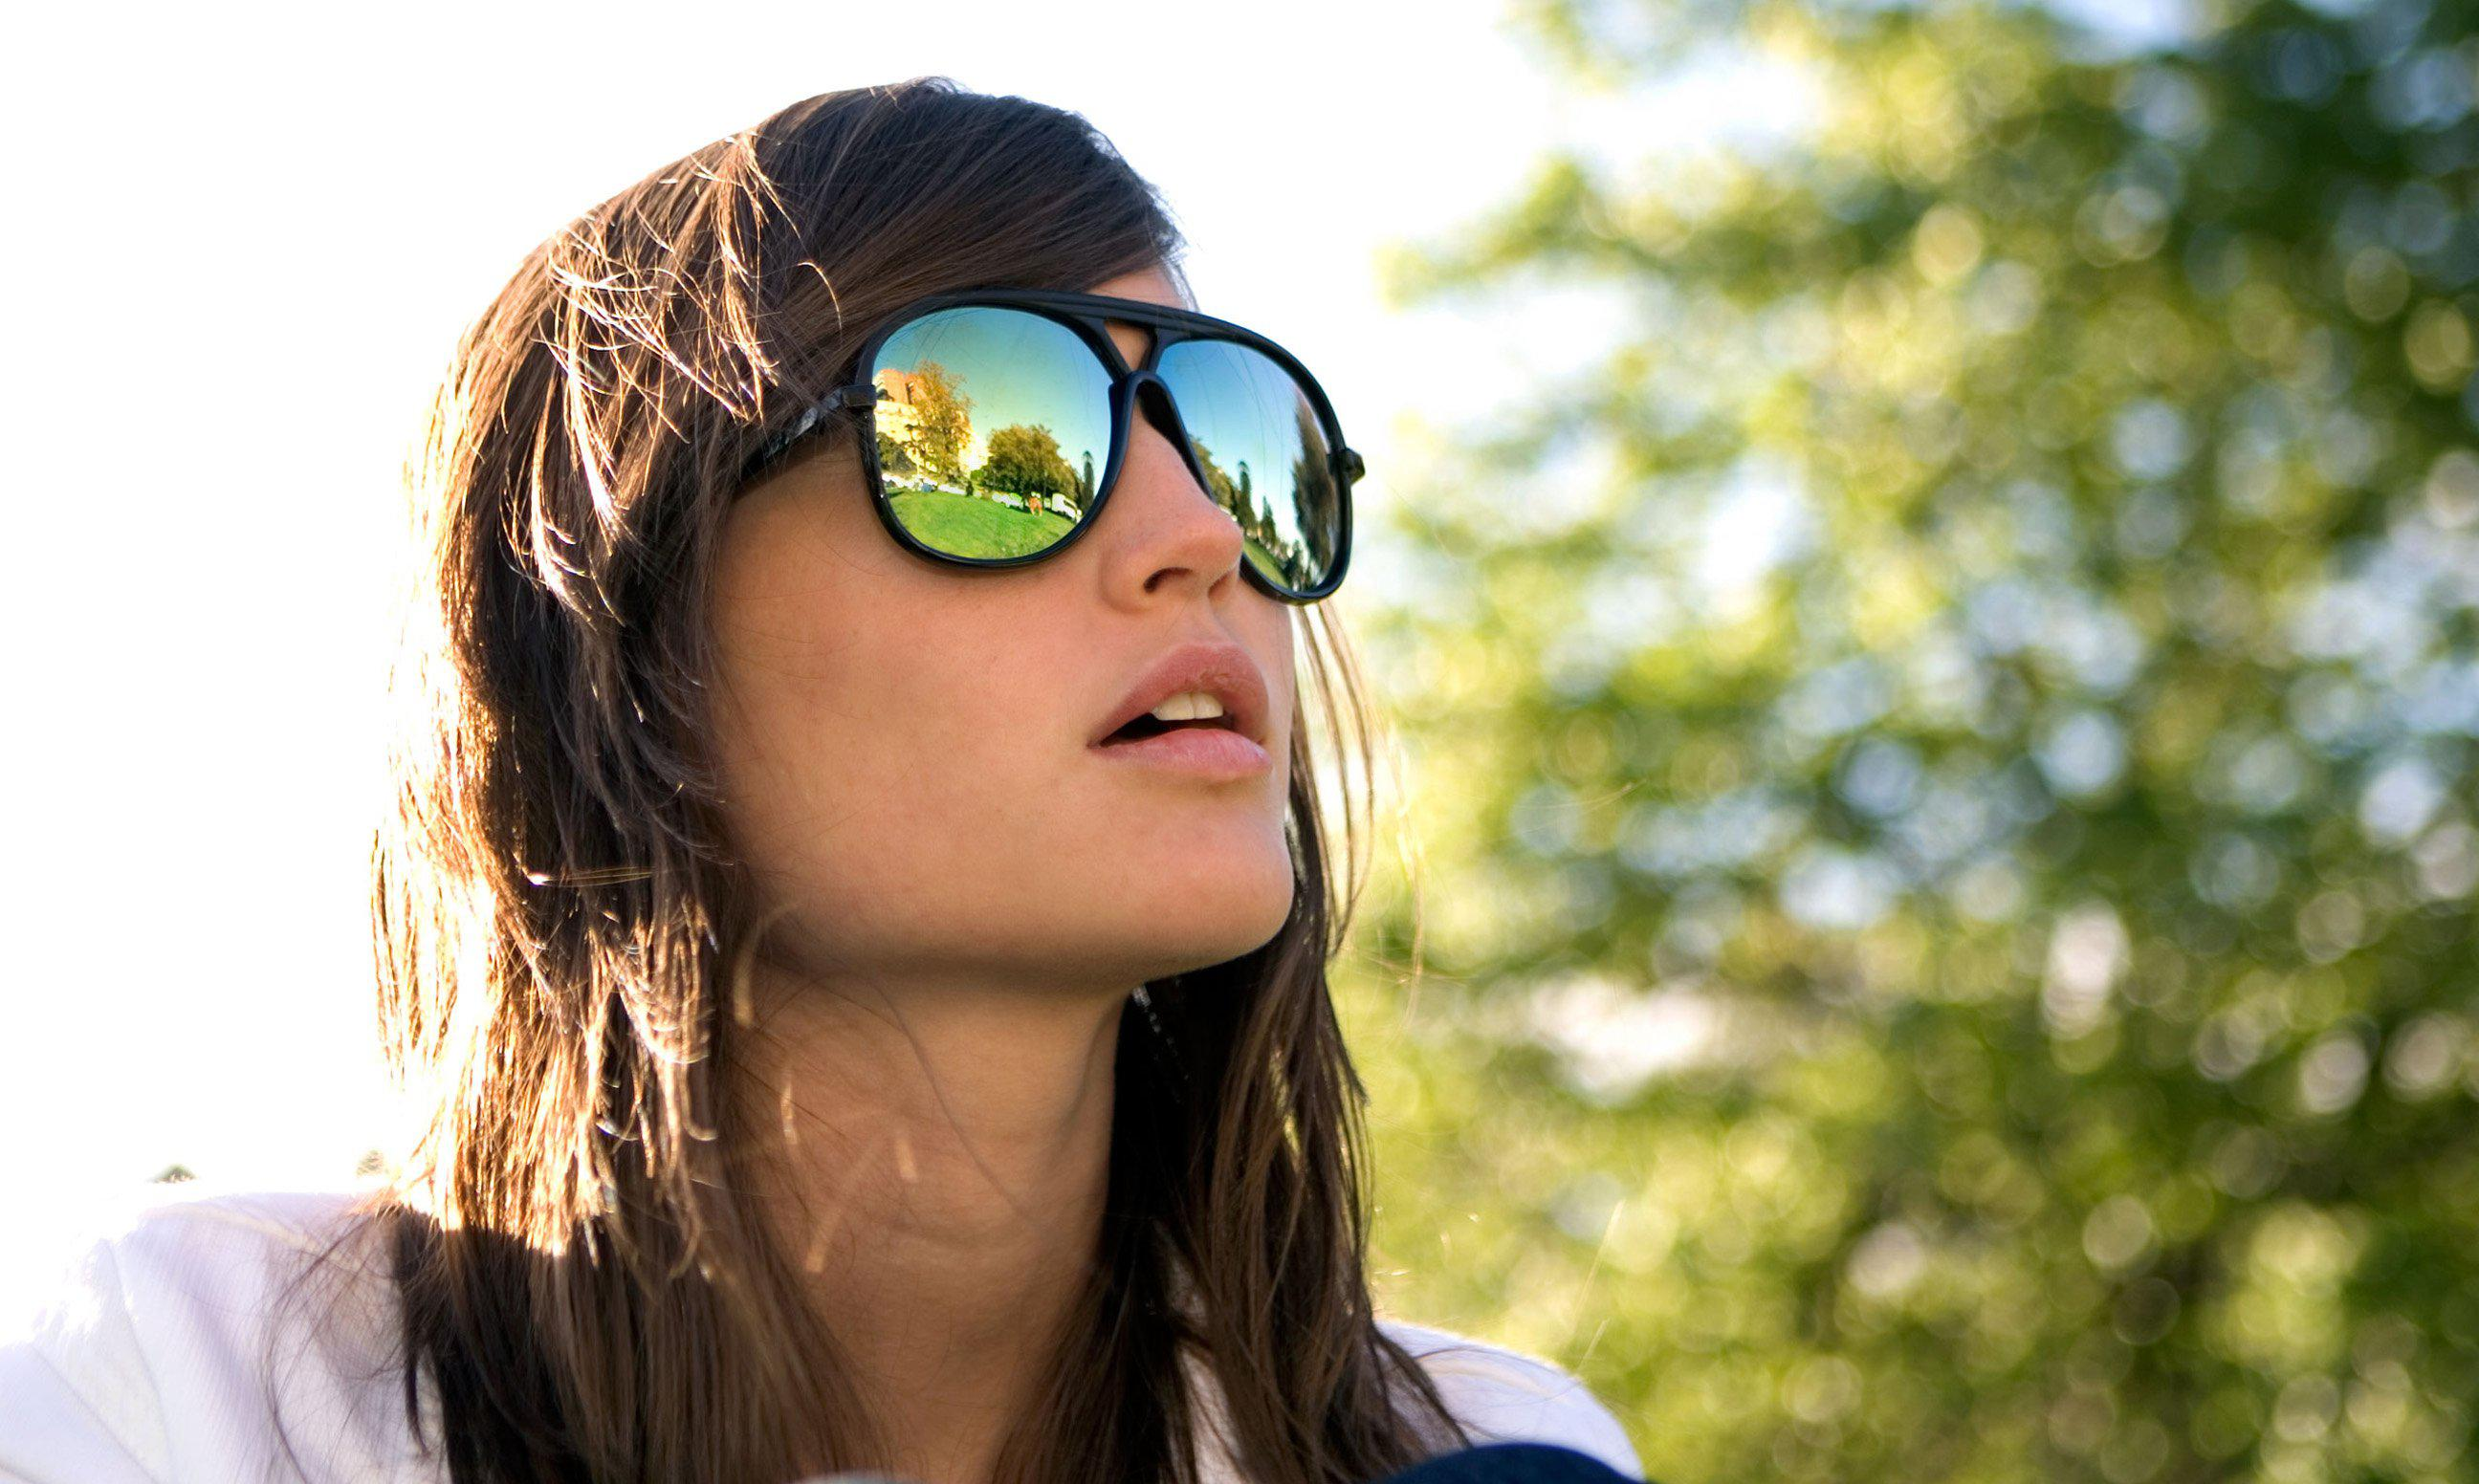 How to: Γυαλιά με χρωματιστούς φακούς, μπερές, τσάντα μέσης, glitter